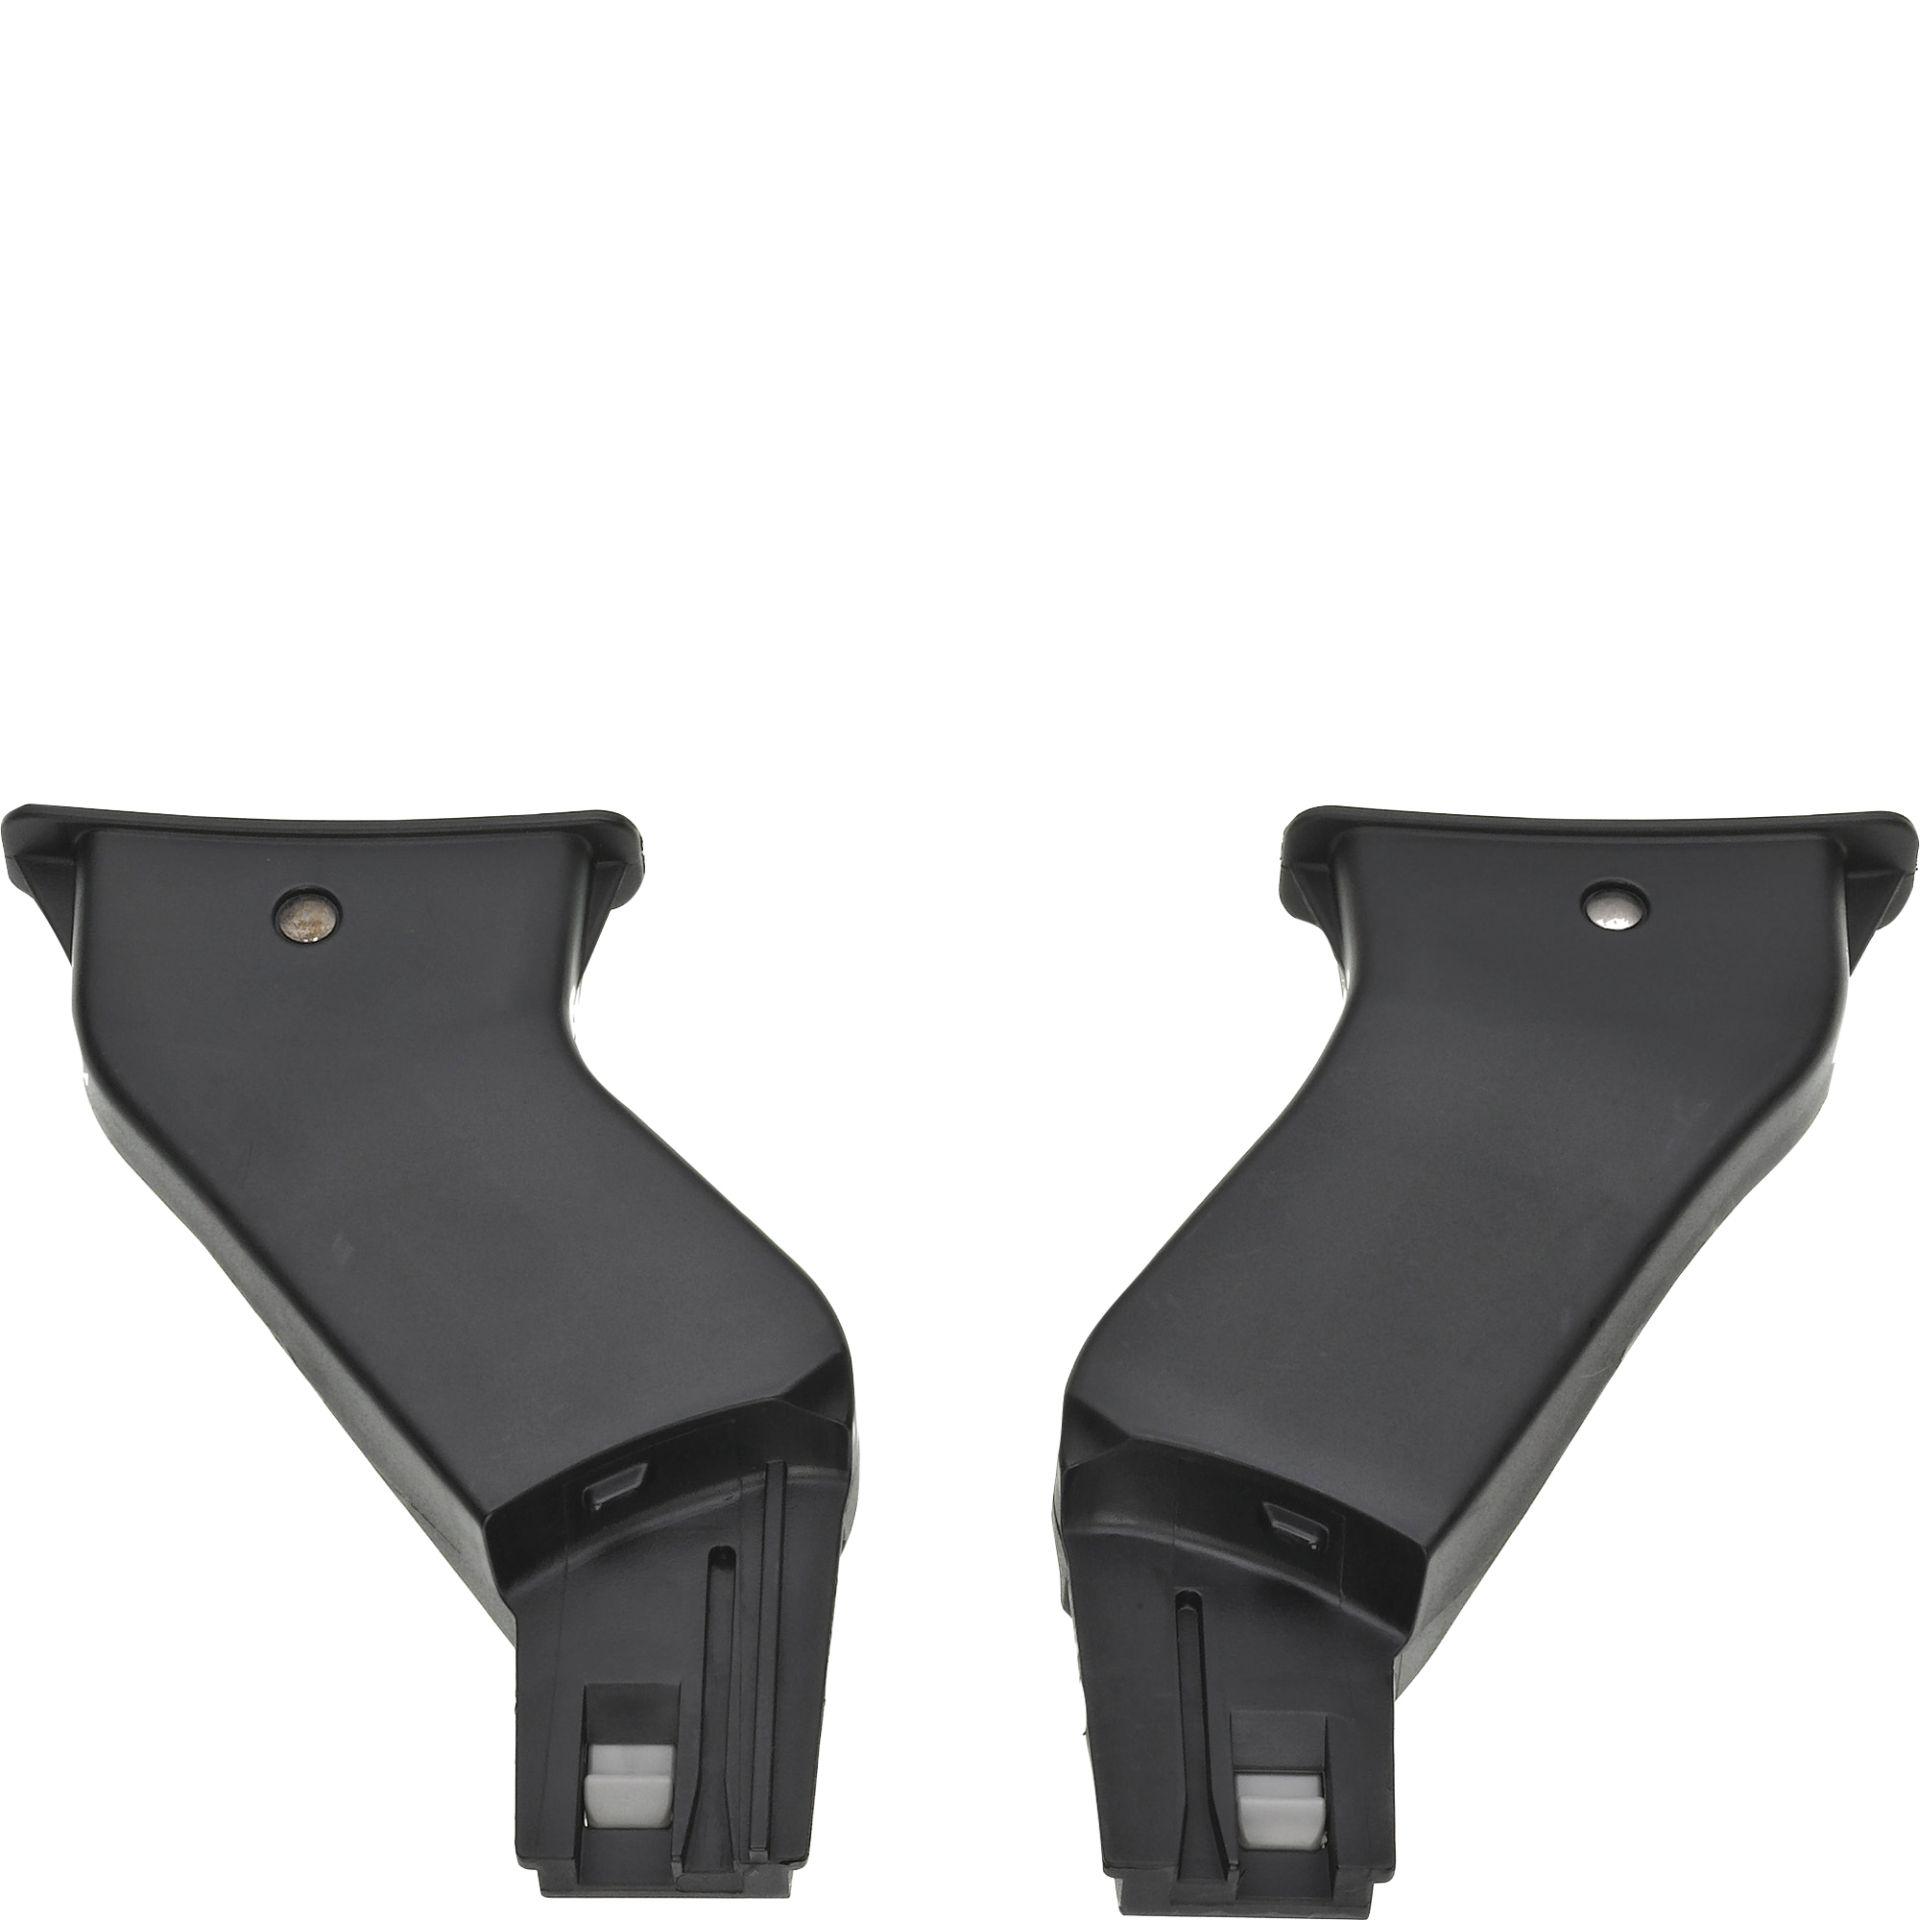 britax r mer b agile double click go adapter 2016 buy at kidsroom strollers stroller. Black Bedroom Furniture Sets. Home Design Ideas